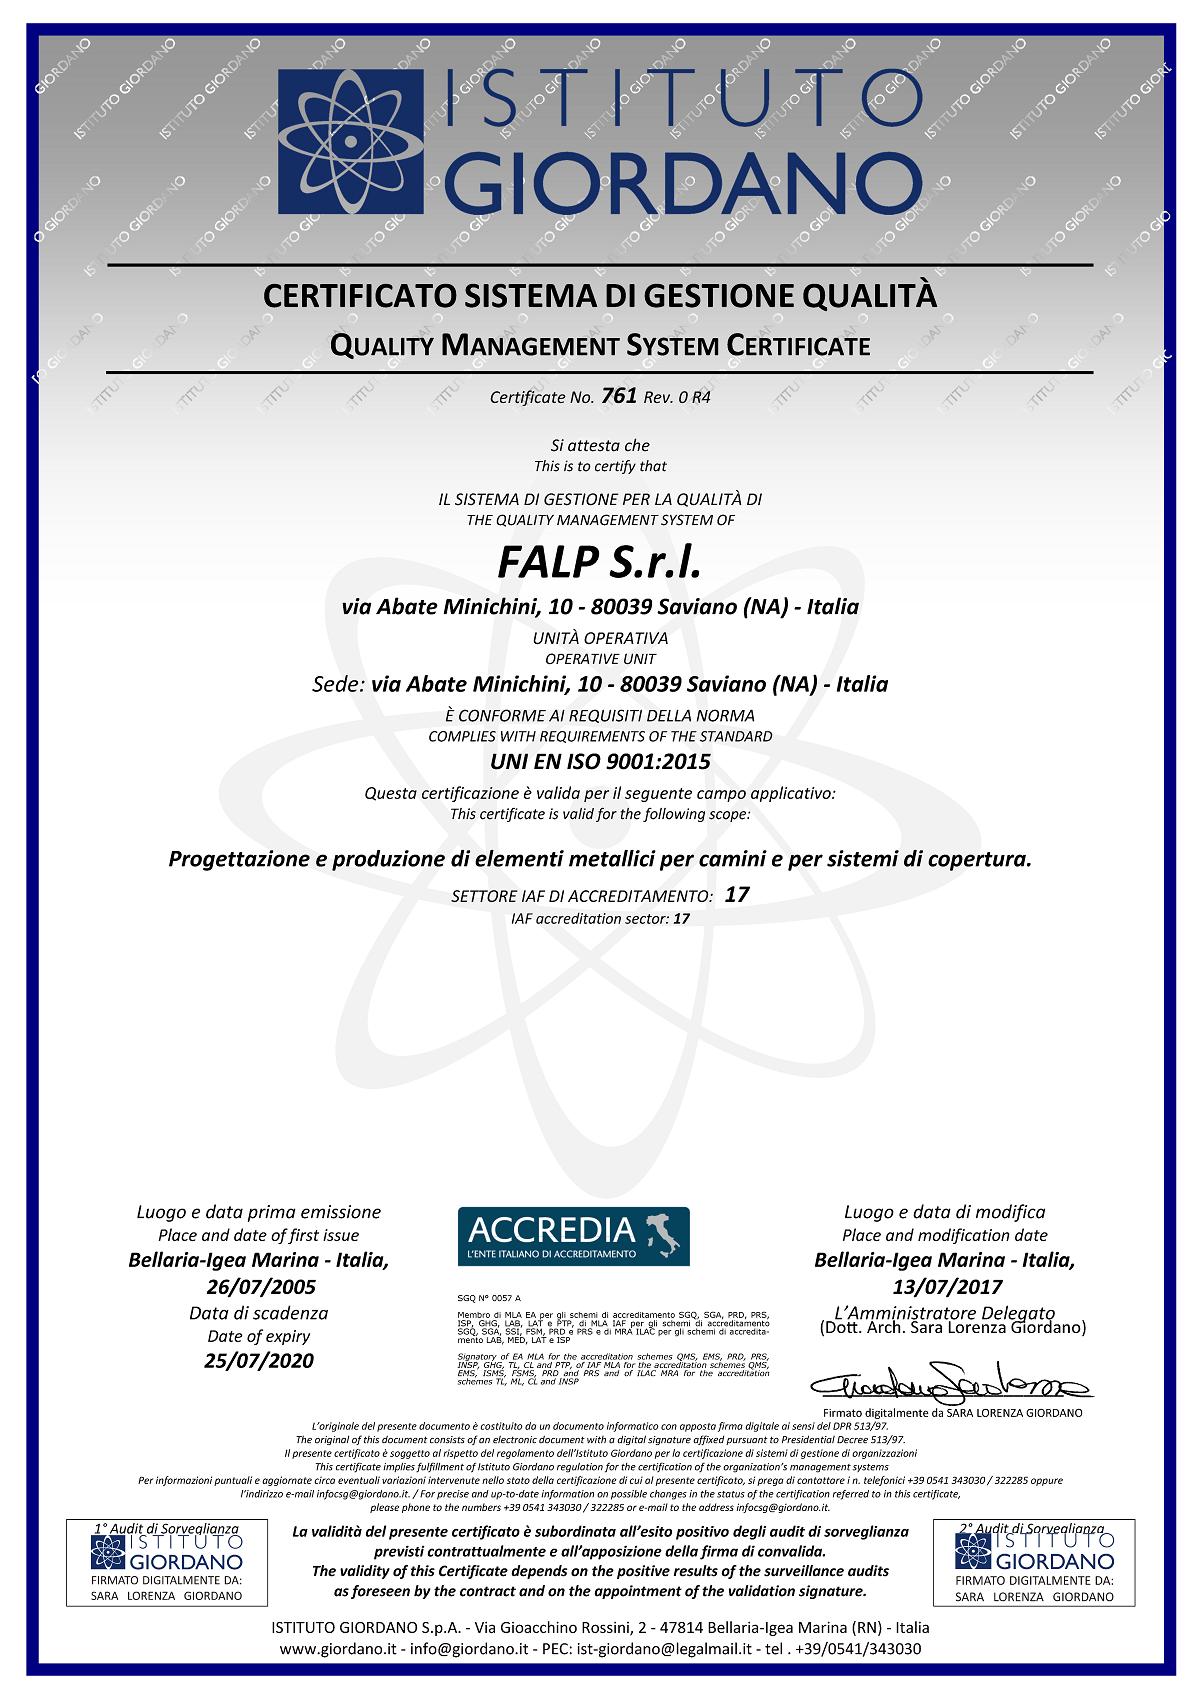 https://www.falpsrl.it/wp-content/uploads/2019/11/certificato-falp-1200x1698.png